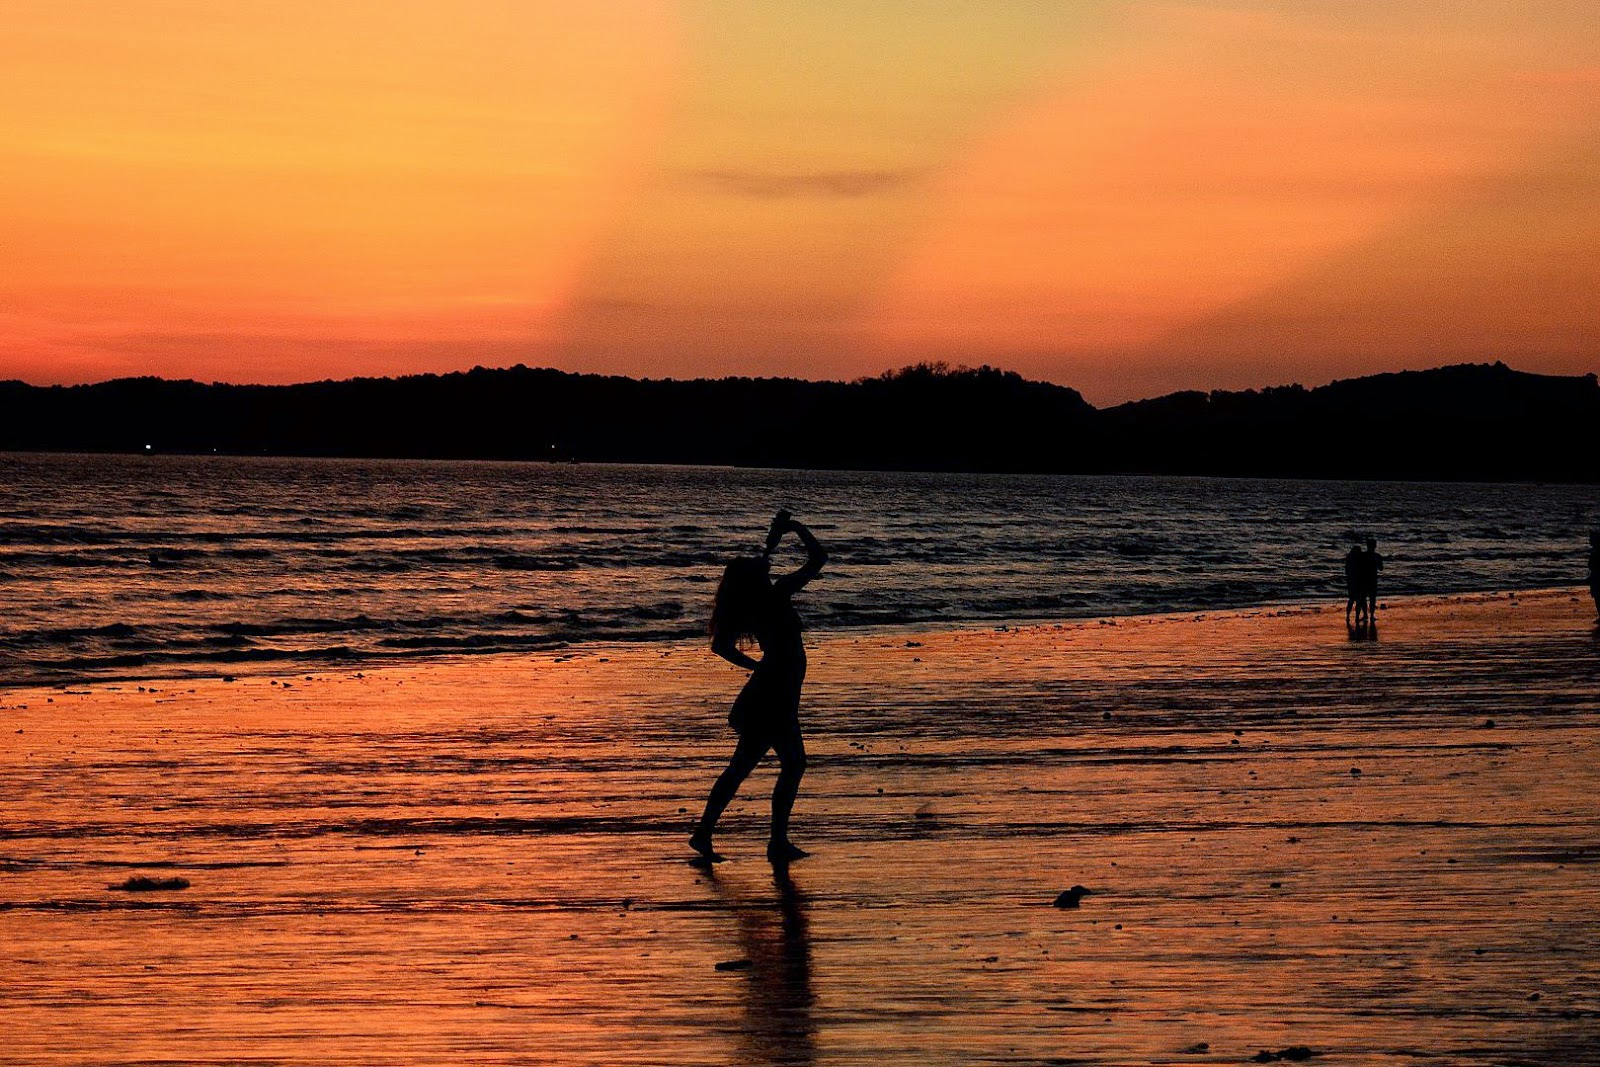 Sunset @ Ao Nang Beach, Krabi, Thailand